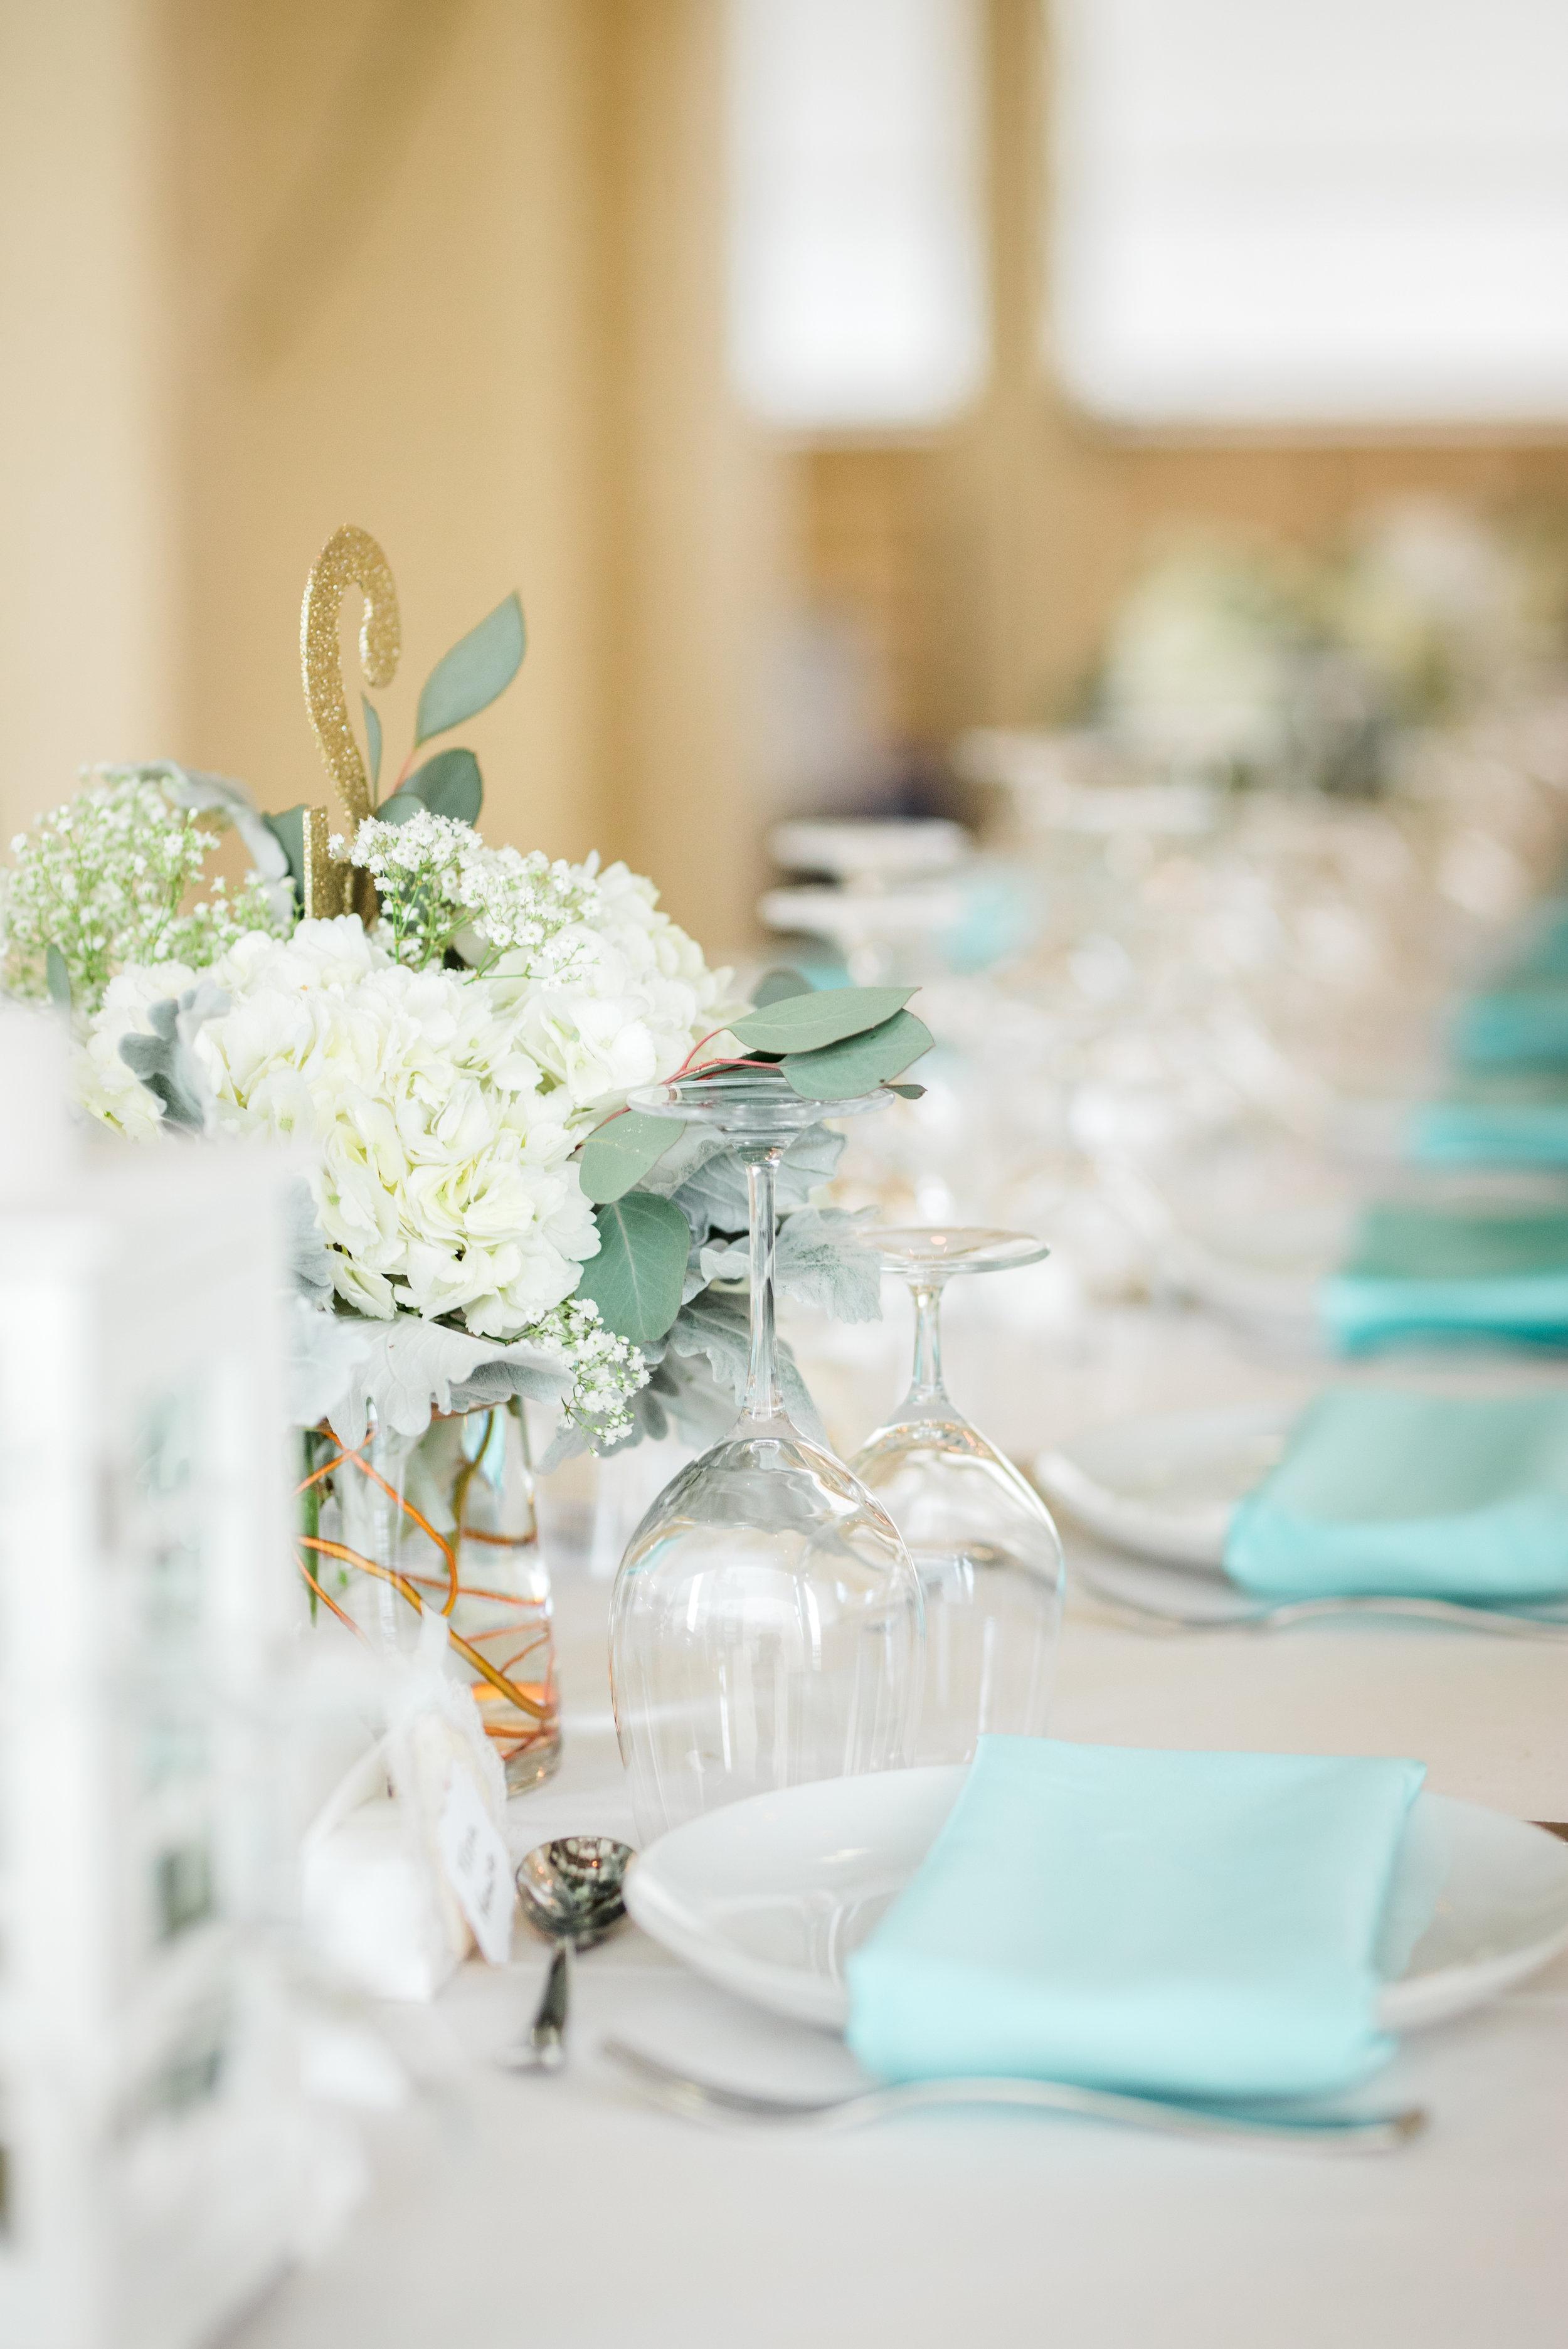 katy-wedding-photographer-houston-wedding-photographer-bride-sugar-land-cypress-richmond-spring-wedding-details.jpg